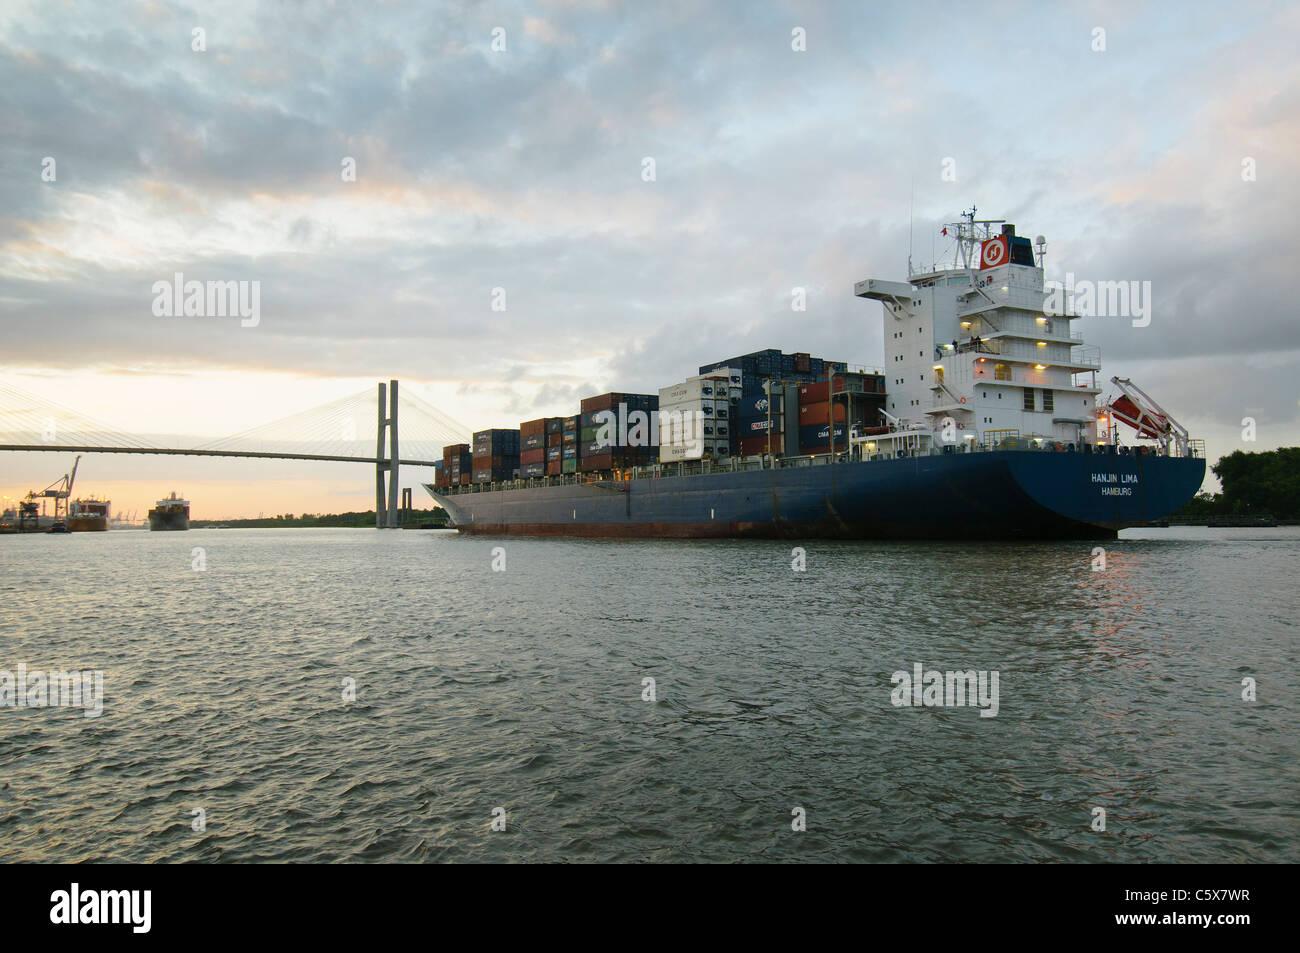 A cargo ship navagates to pass under the Talmadge Memorial Bridge in Savannah, Georgia at sunset. - Stock Image